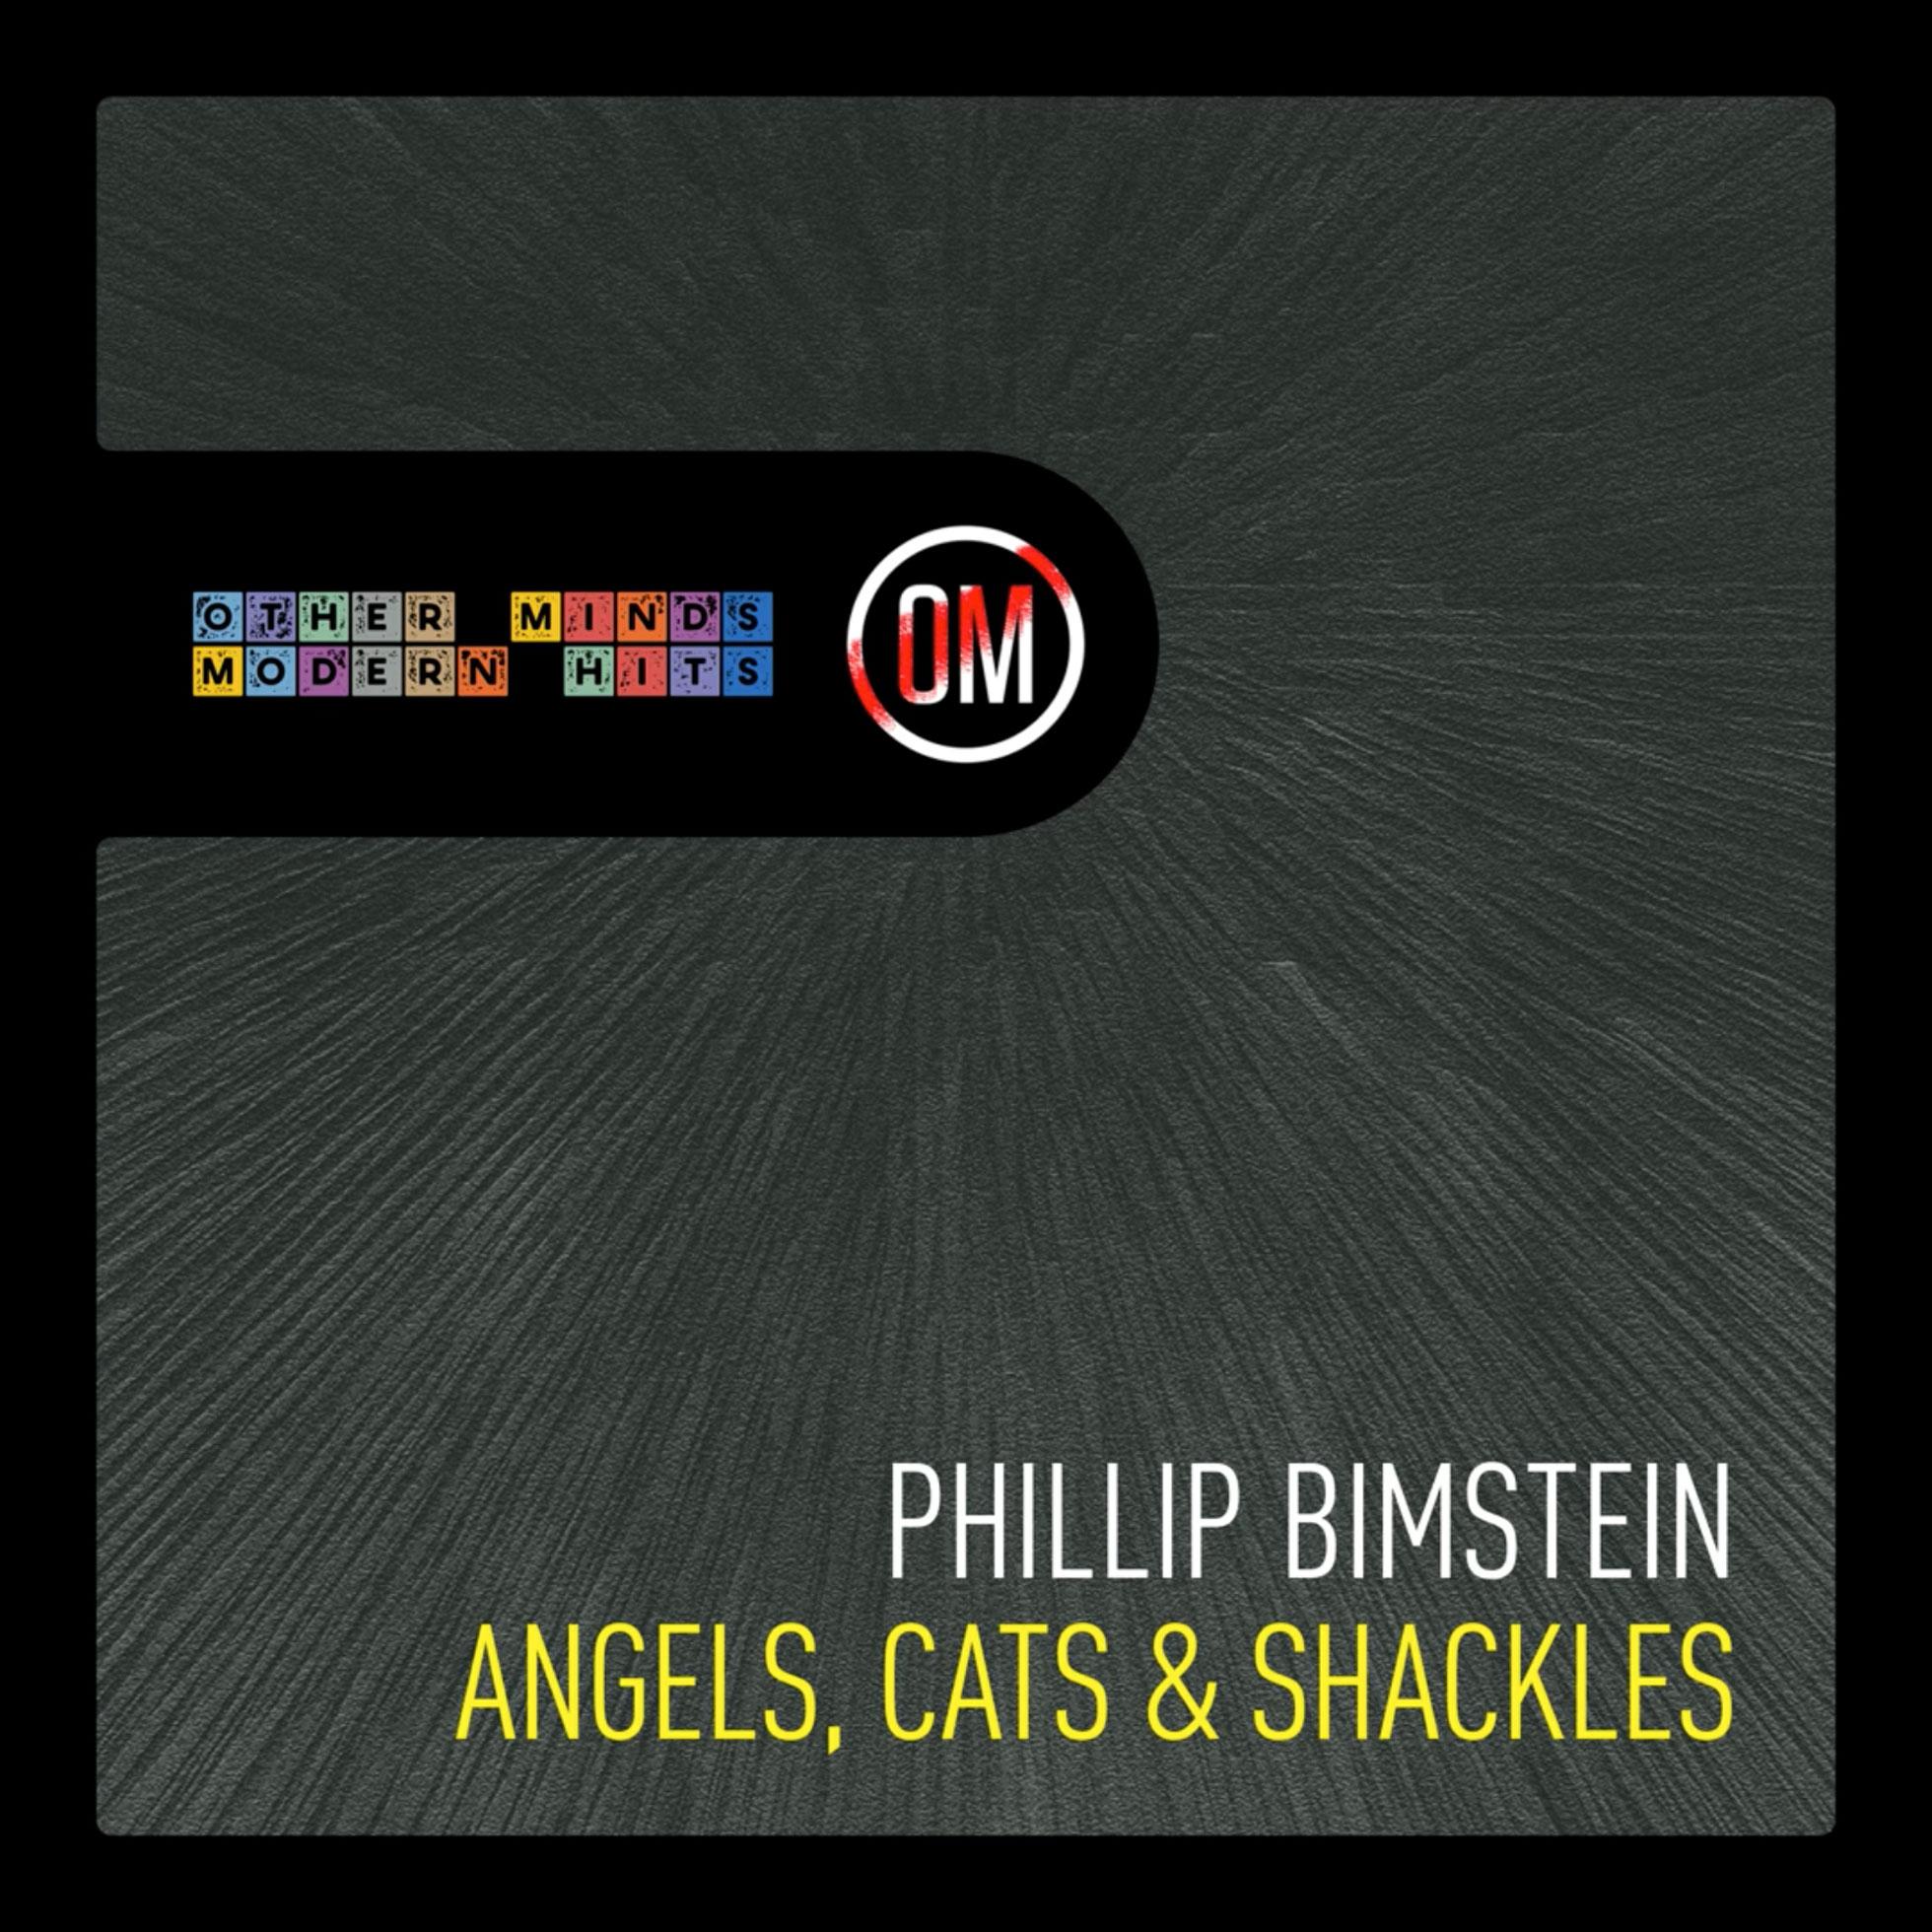 Angels, Cats & Shackles